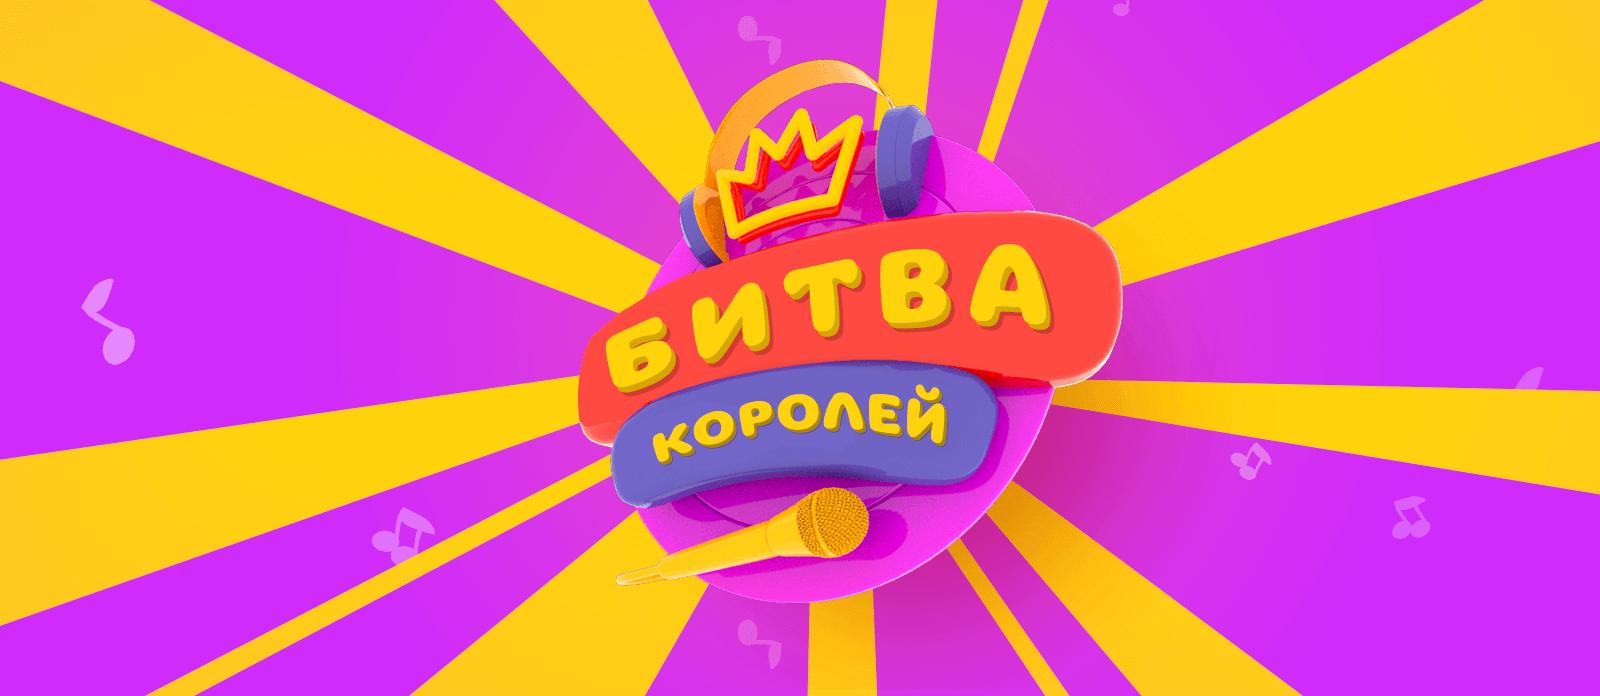 Битва Королей!